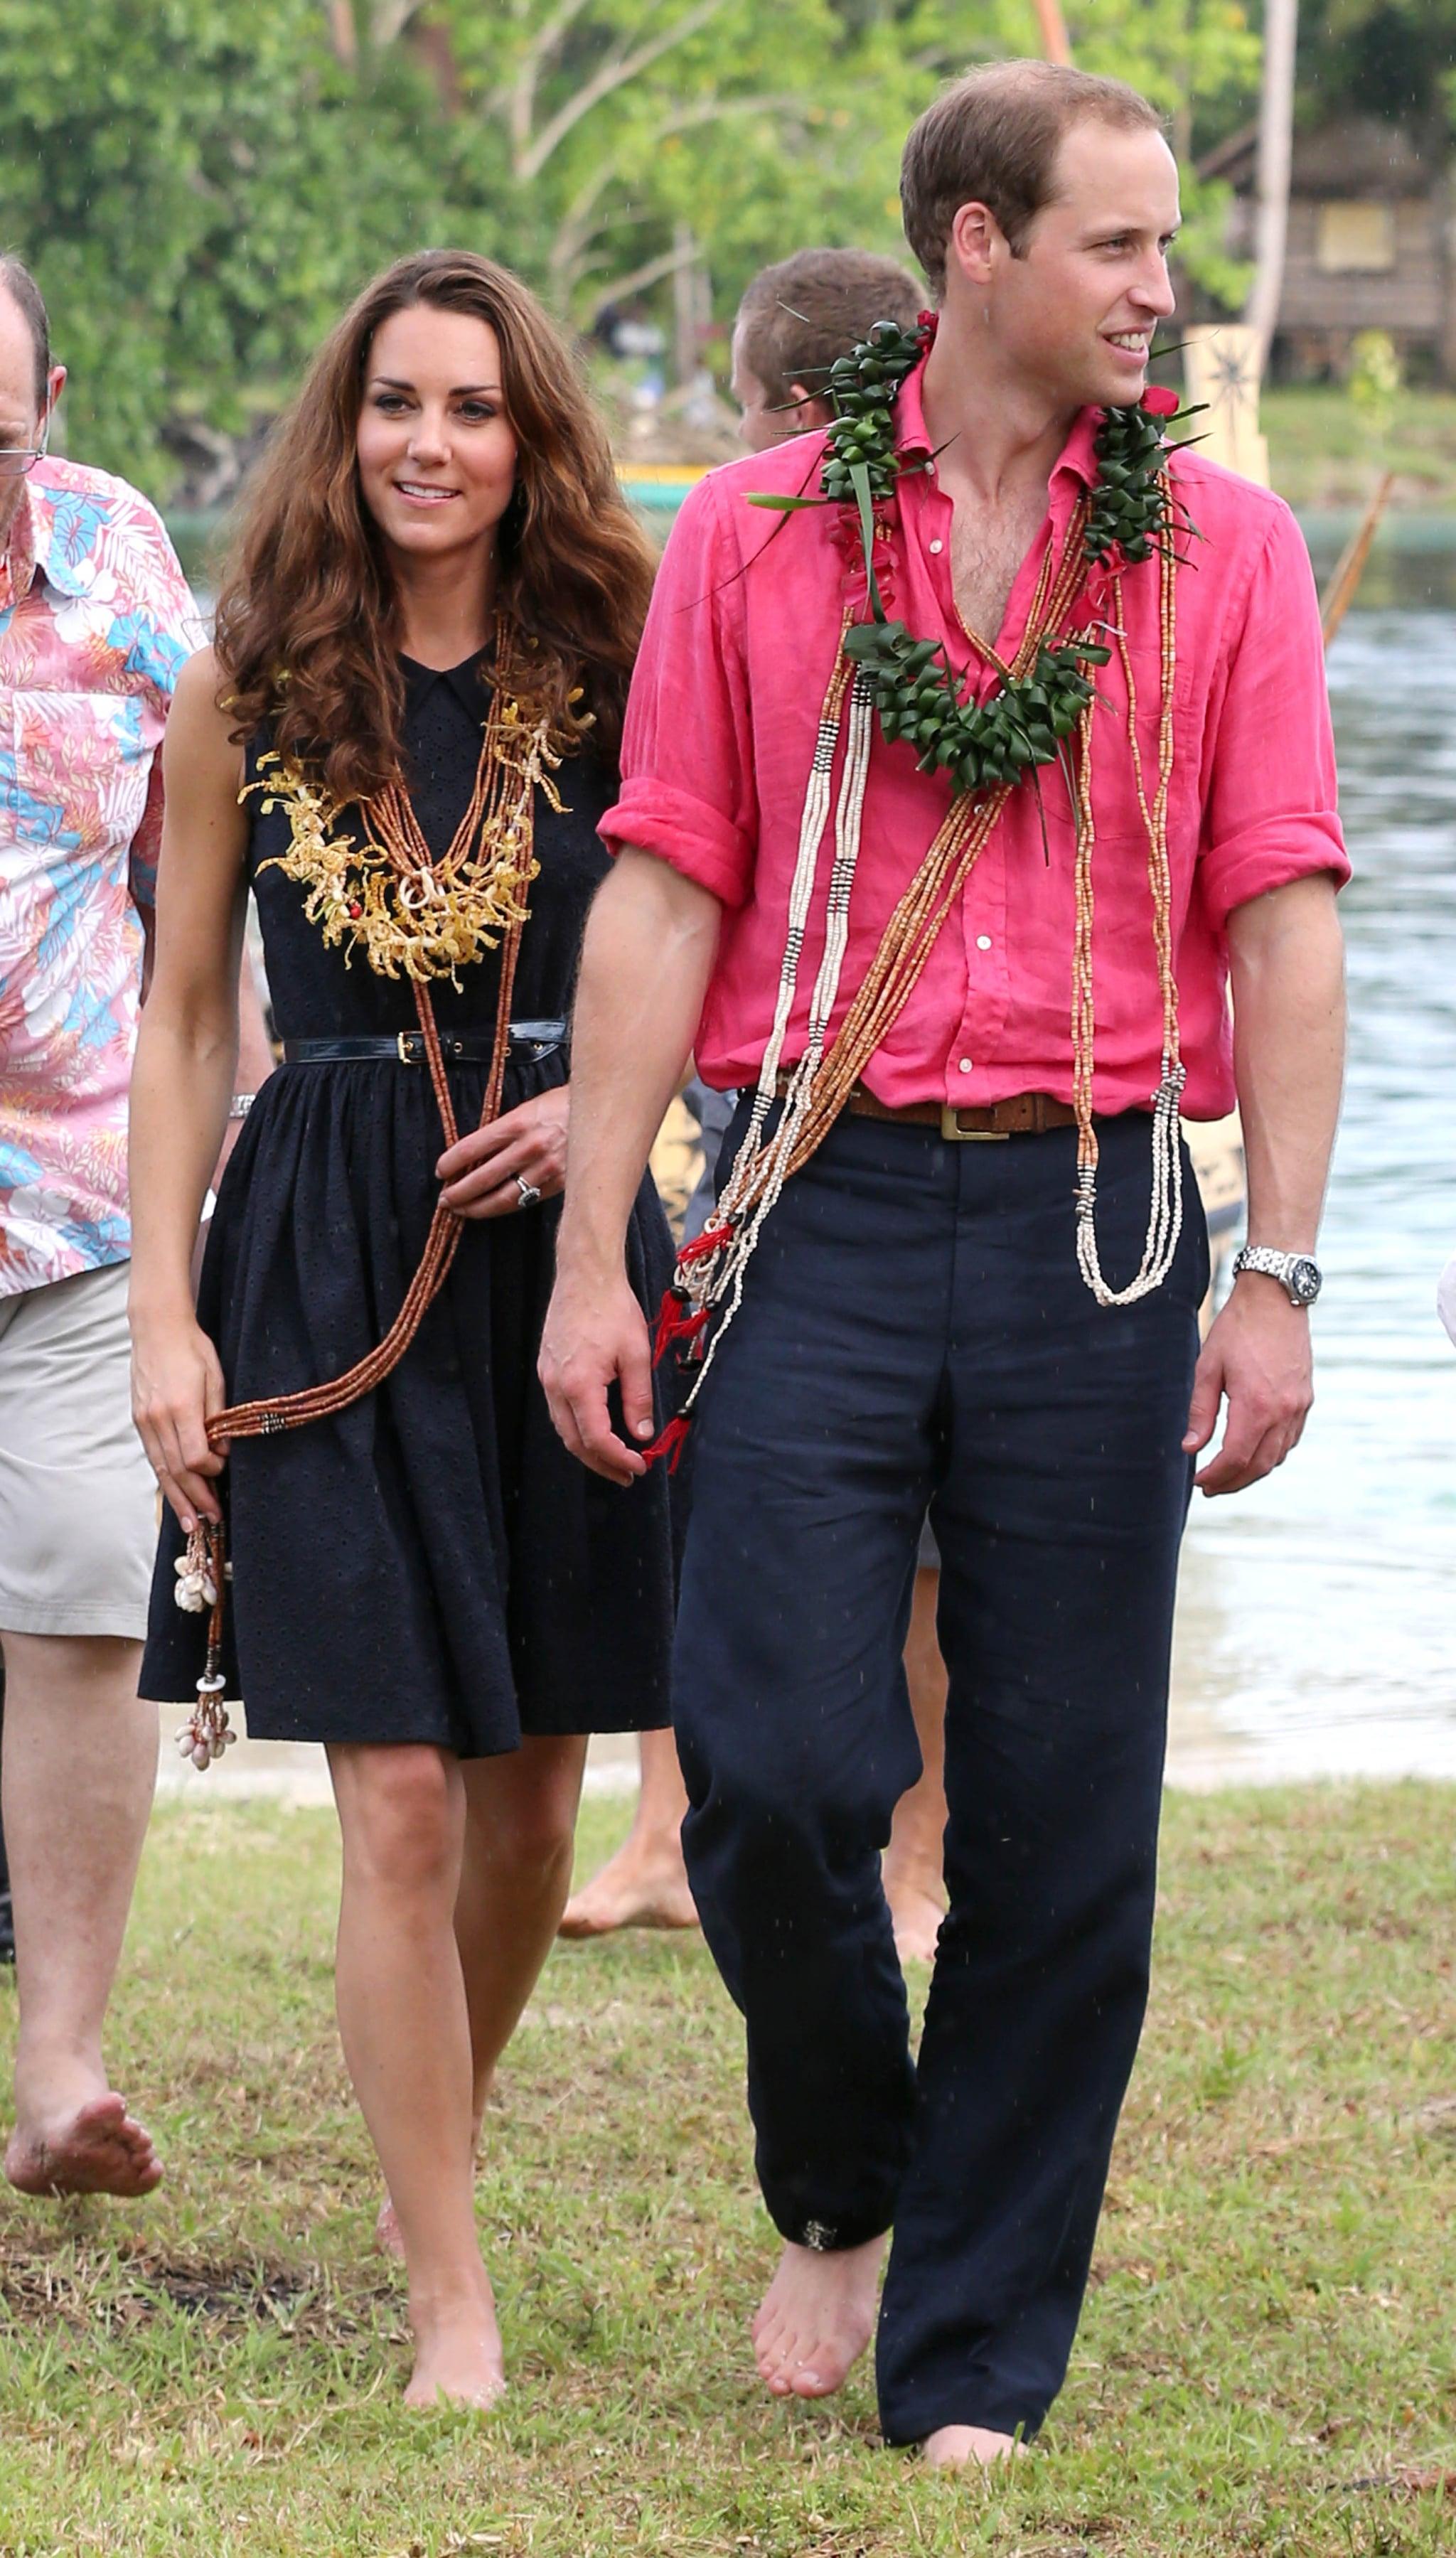 The Royal Couple in Tuvanipupu Island